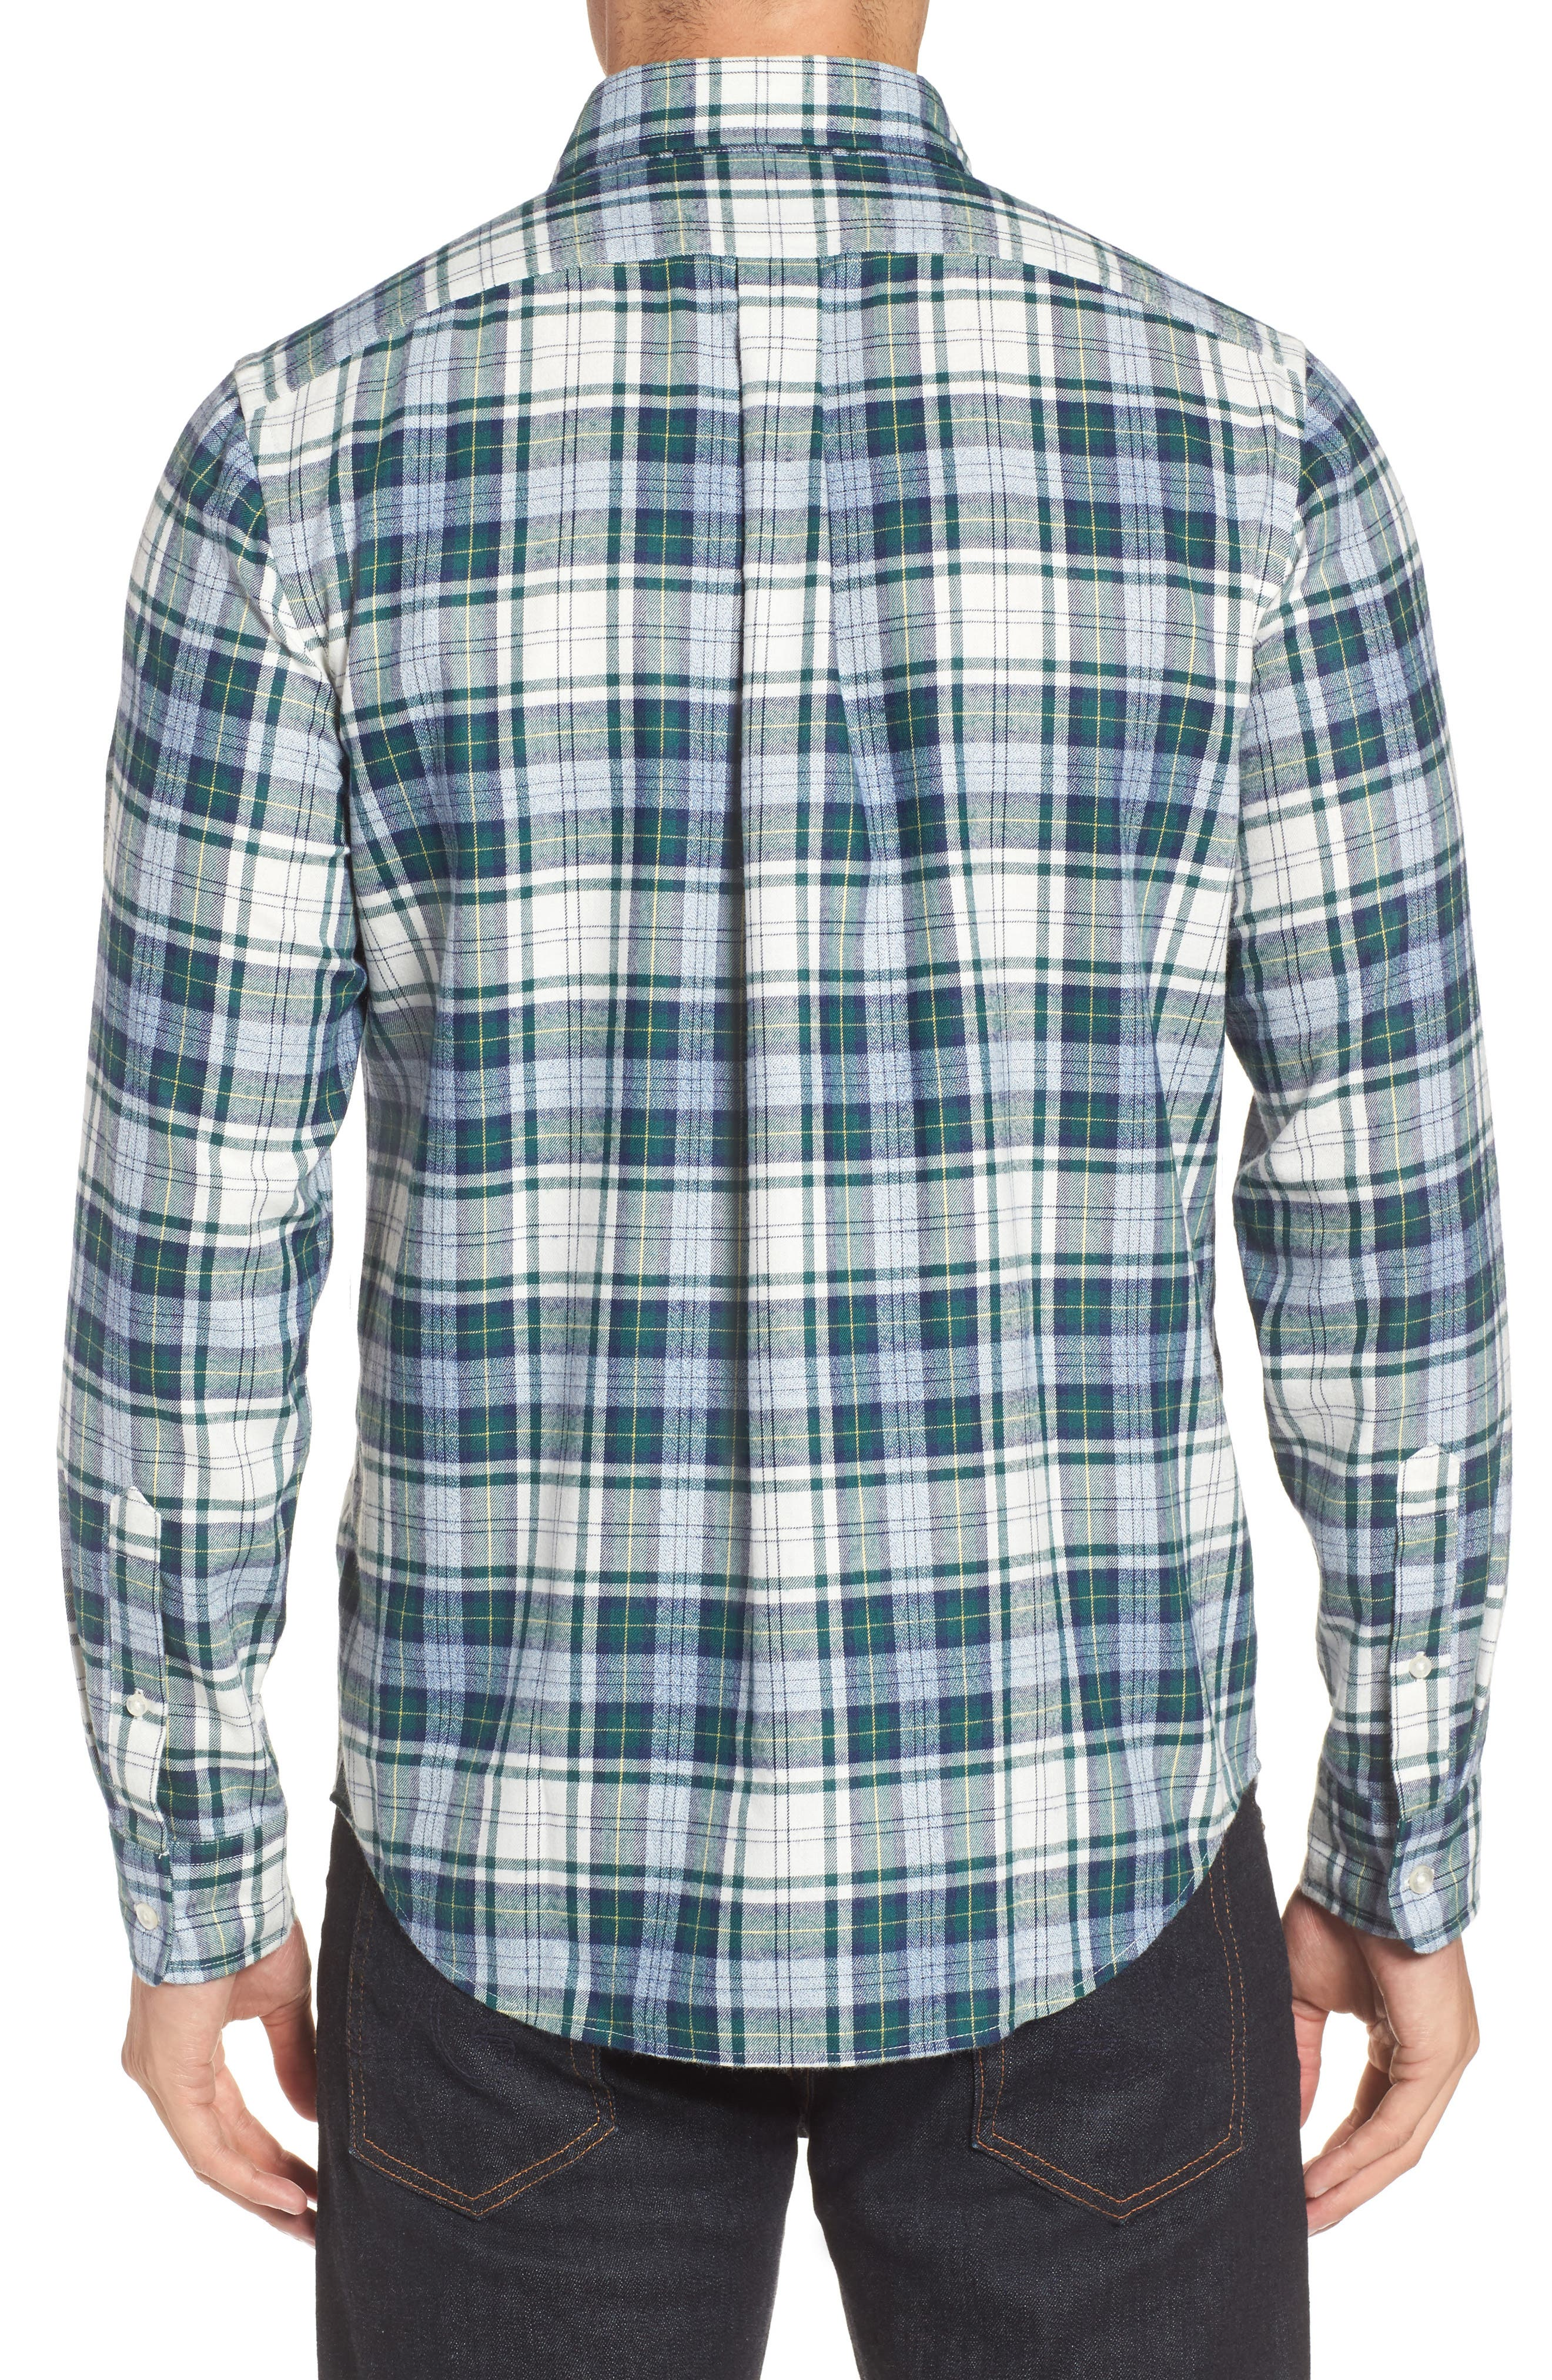 Tucker Hayward Point Slim Fit Plaid Sport Shirt,                             Alternate thumbnail 2, color,                             342